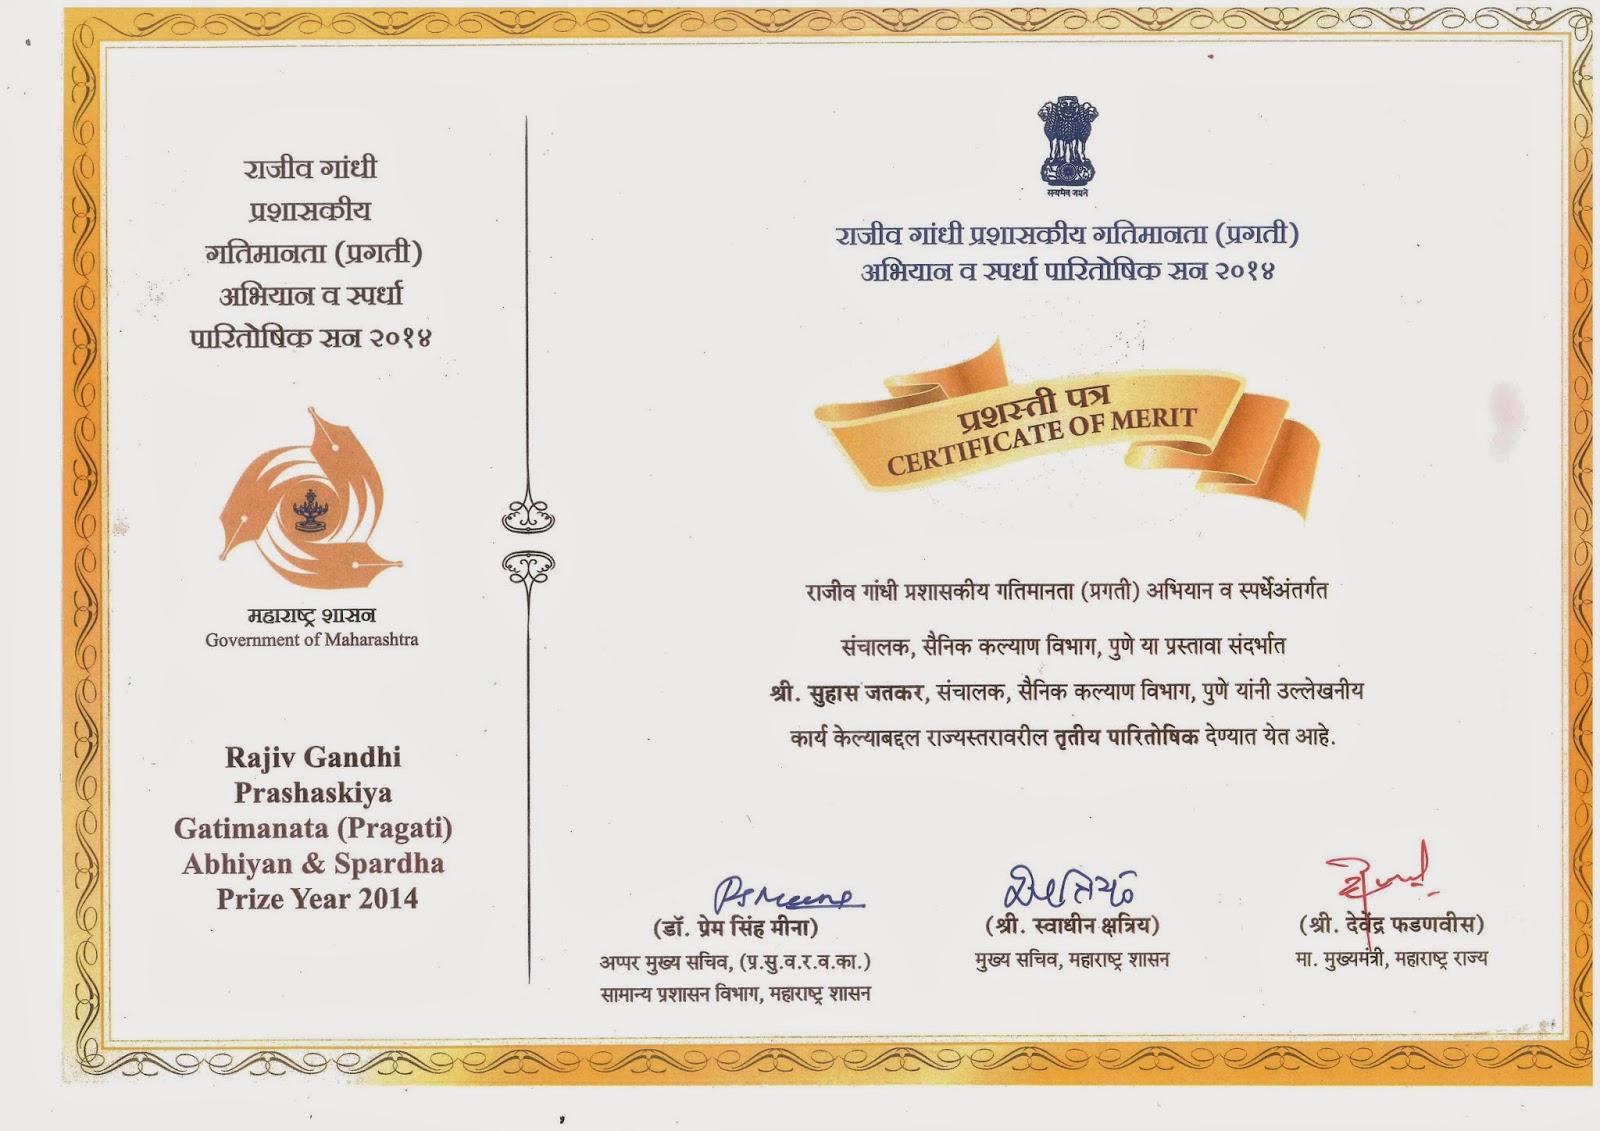 Department of Sainik Welfare Maharashtra April 2015 – Merit Certificate Comments